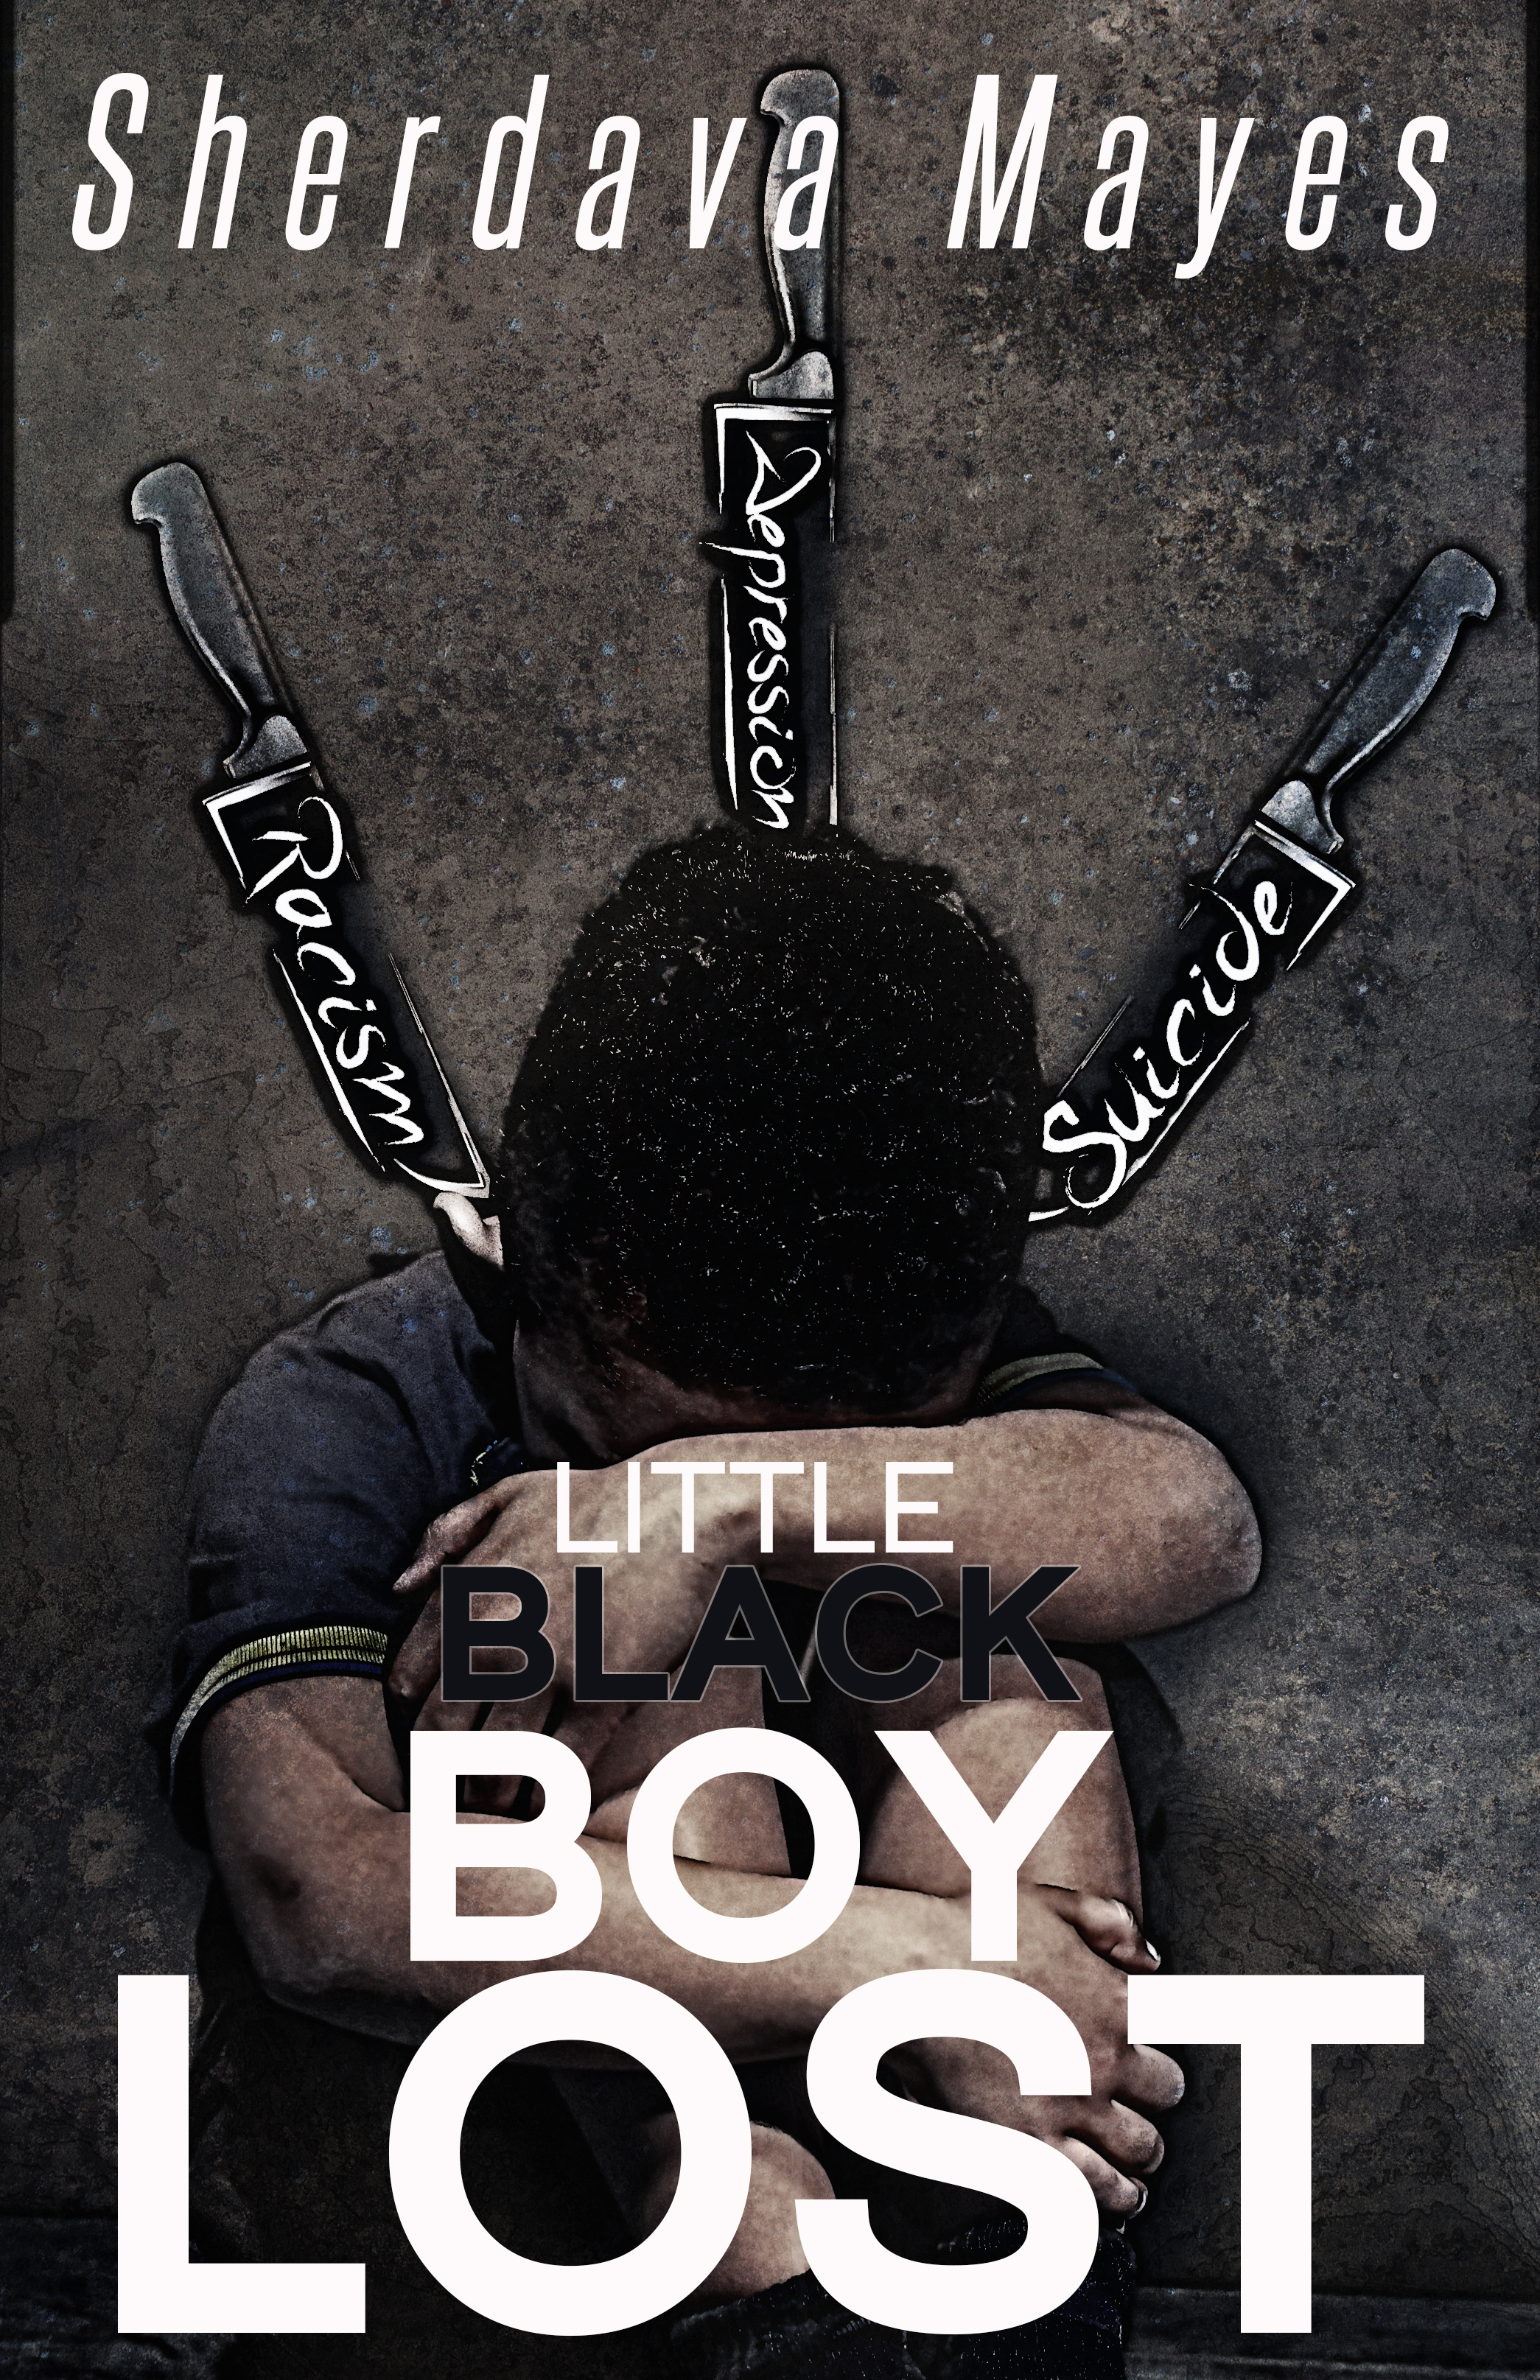 little black boy lost edit name itallic.